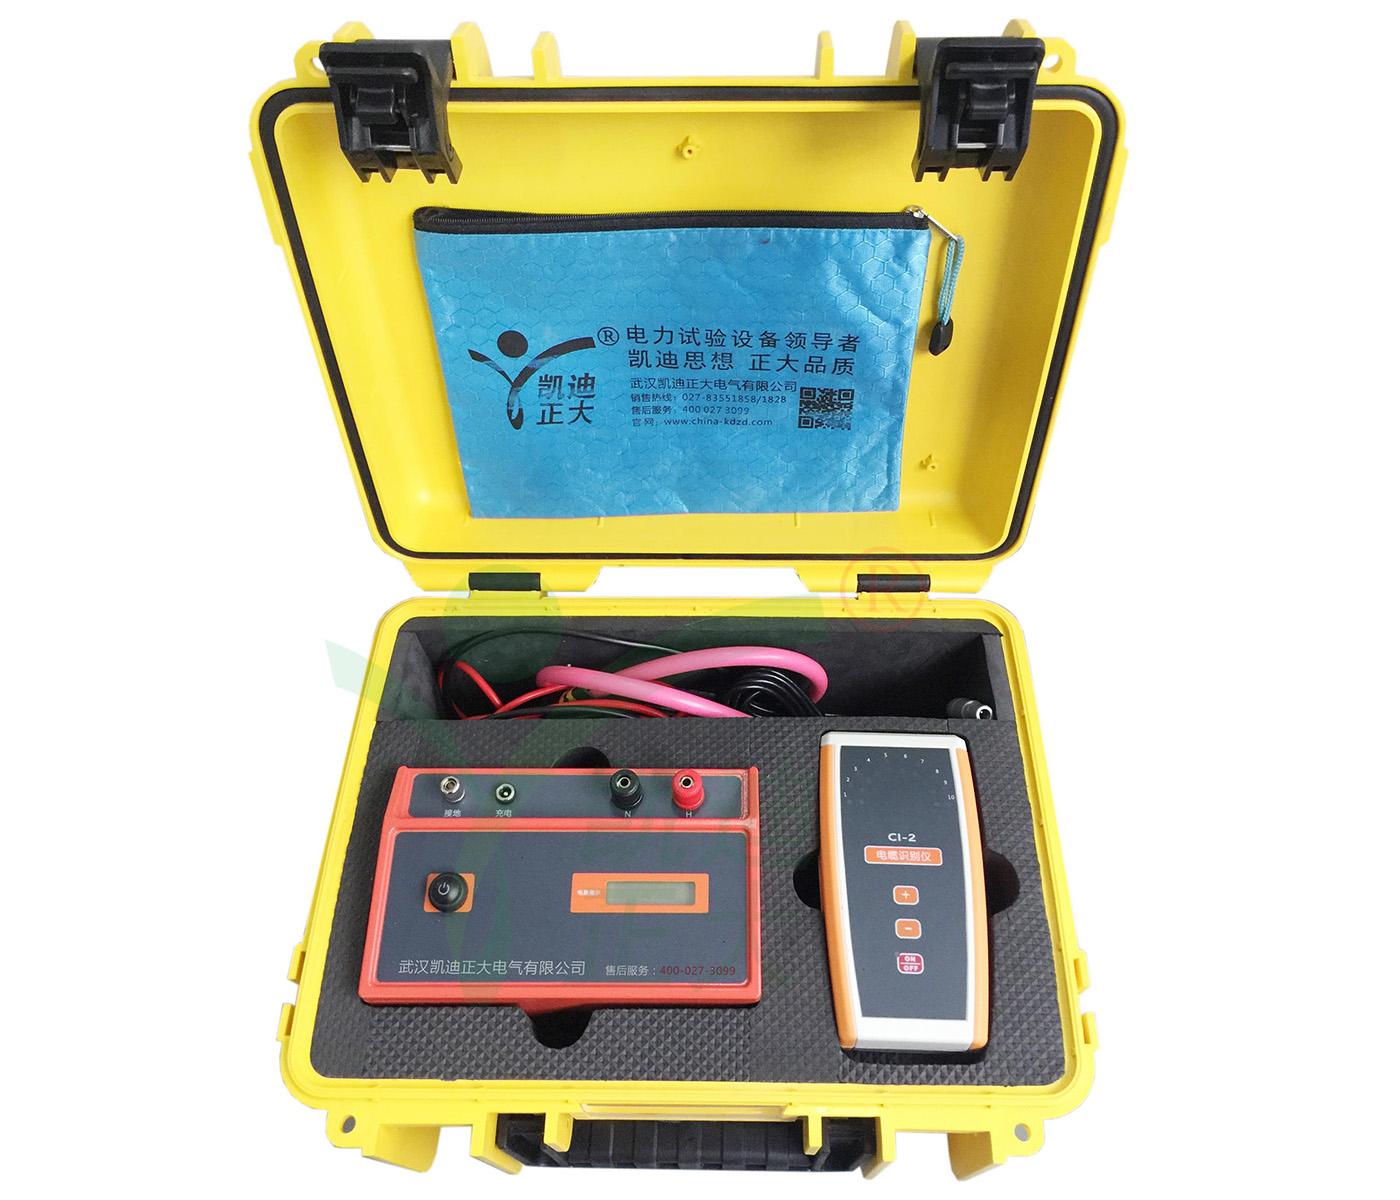 KD-214A 电缆识别仪(停电电缆识别)